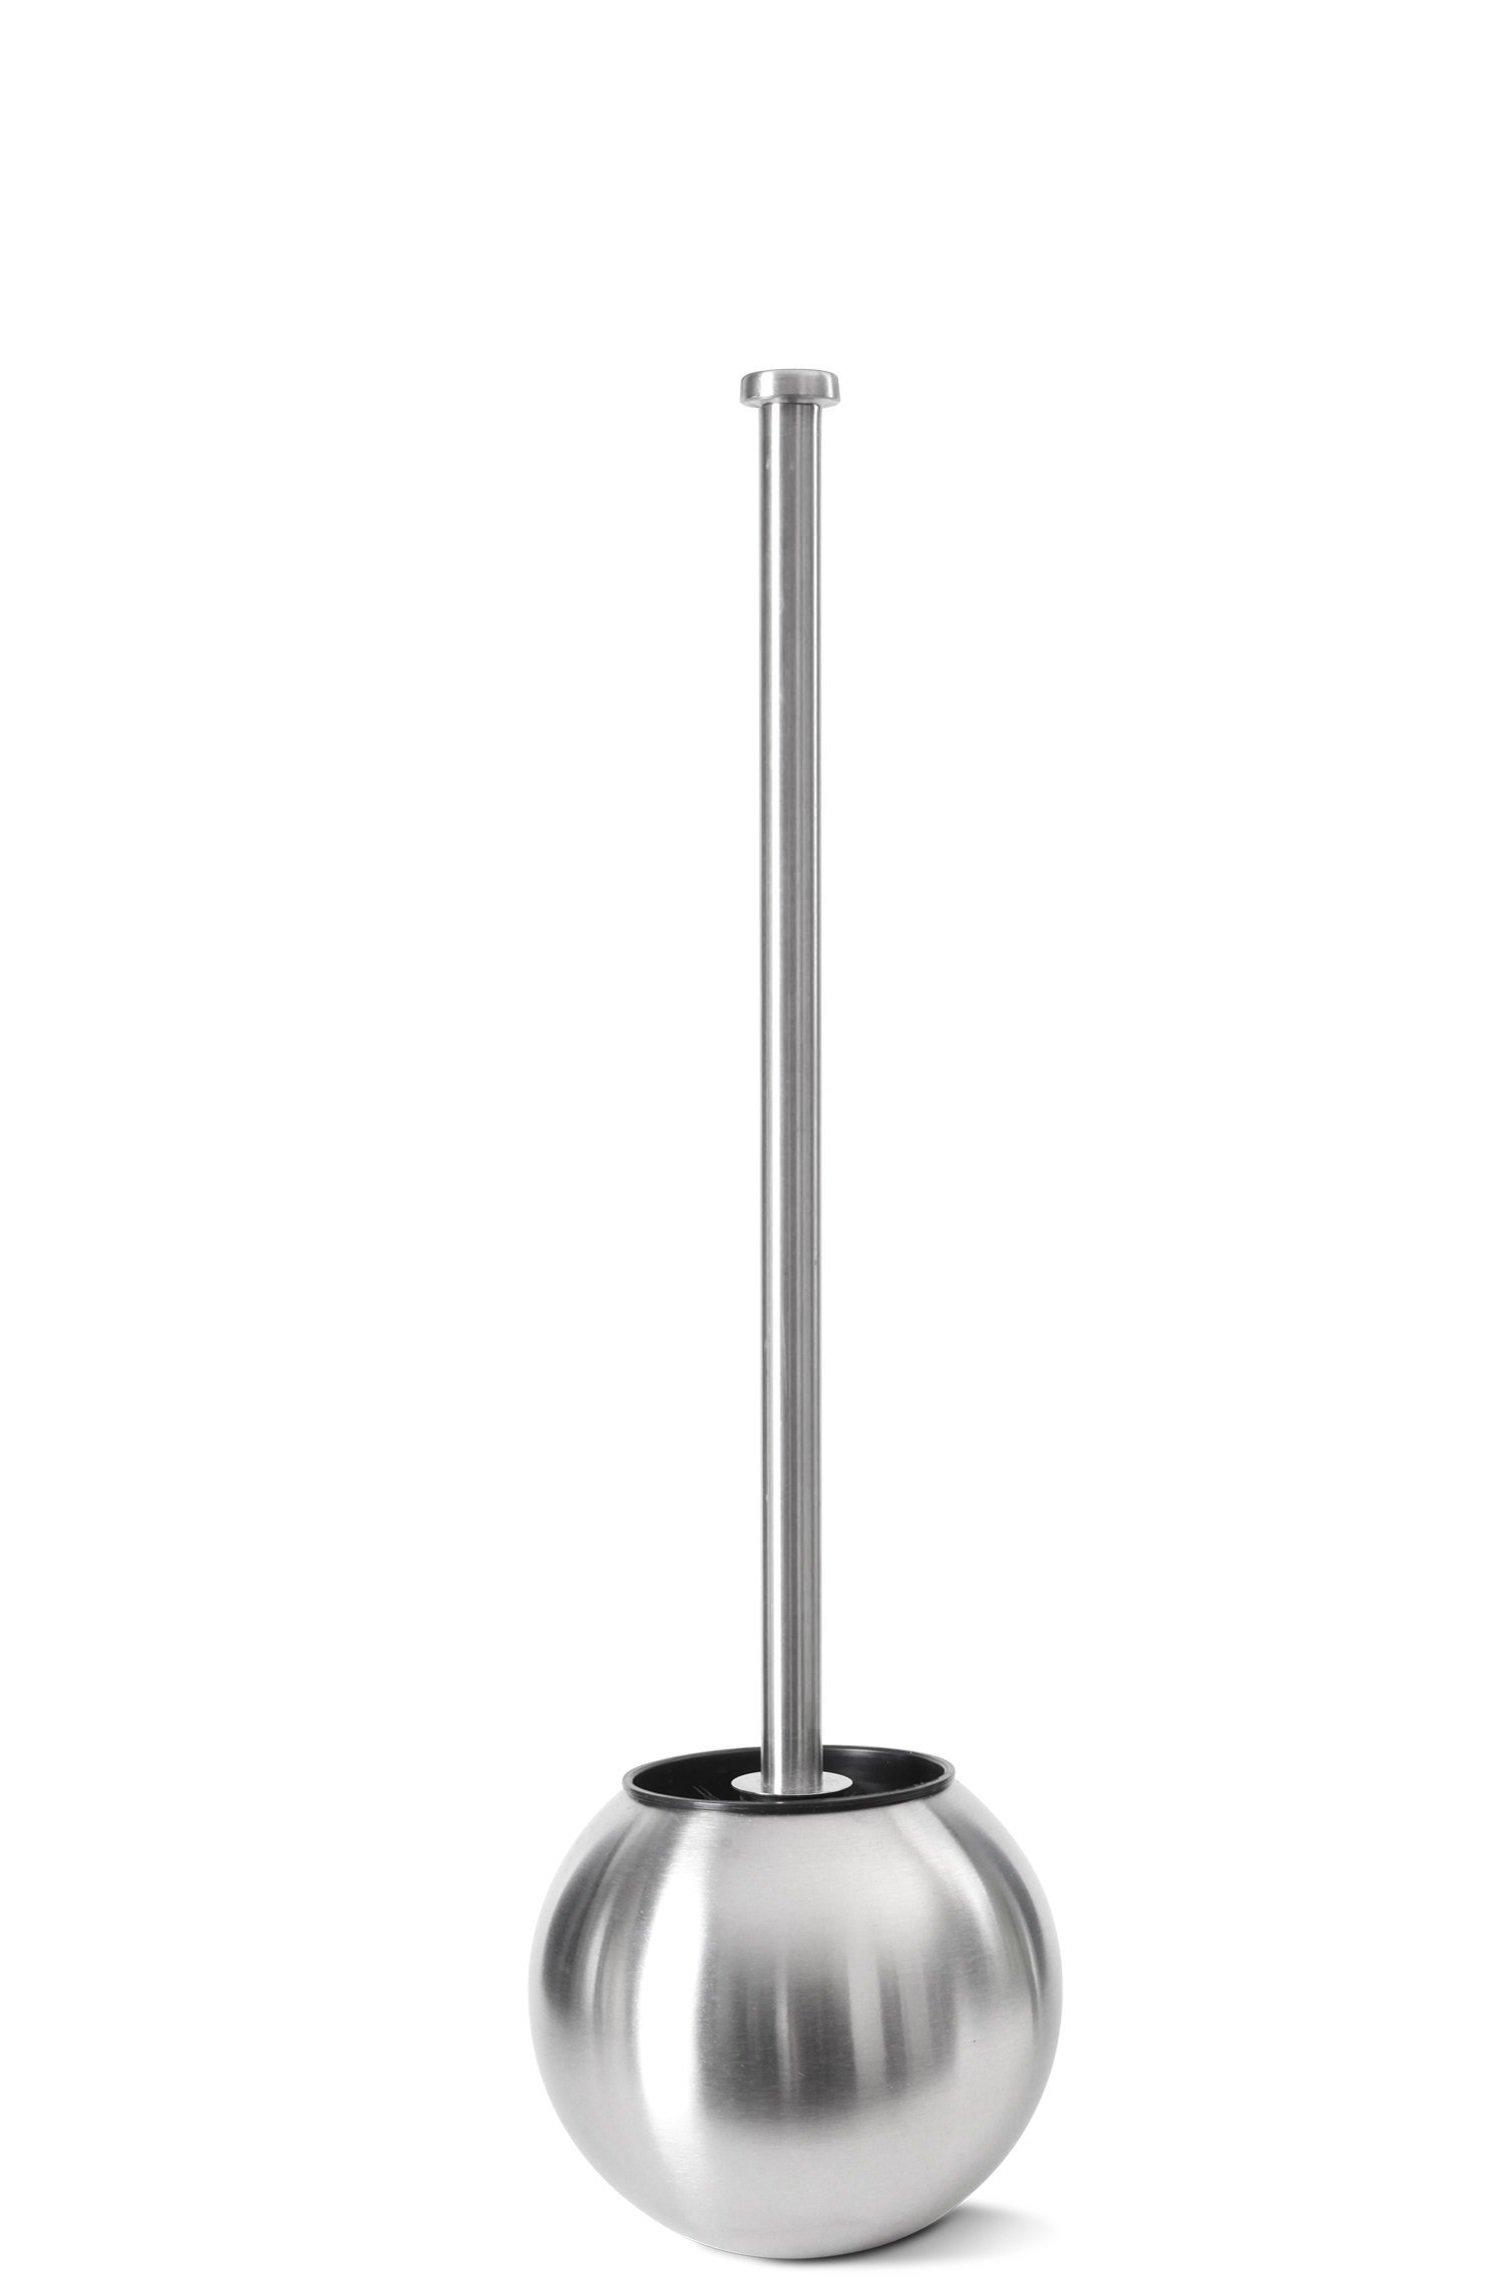 Hem Varor Stylish Round Stainless Steel Toilet Brush and Holder (Medium) 19.5 inch